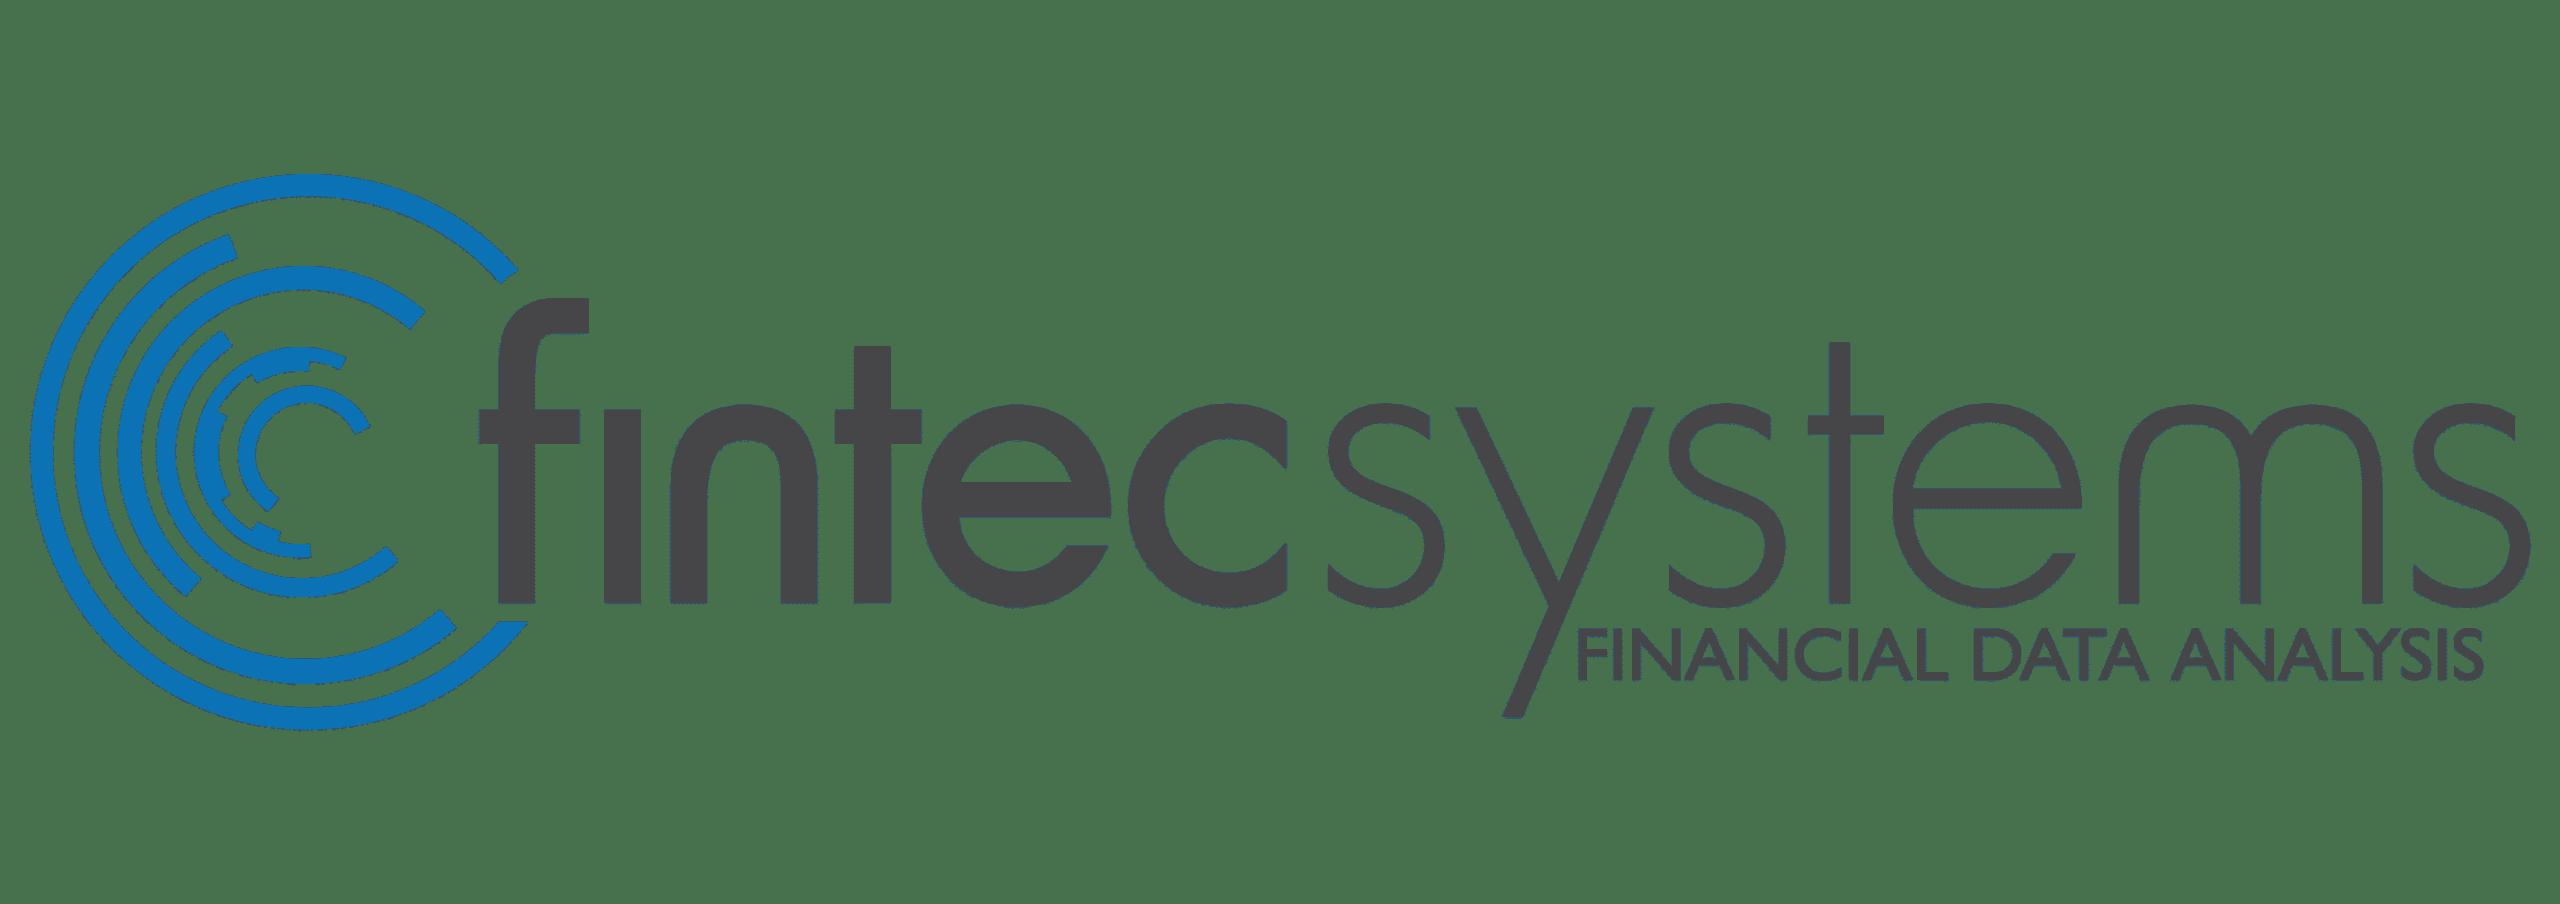 loan origination software fintecsystems